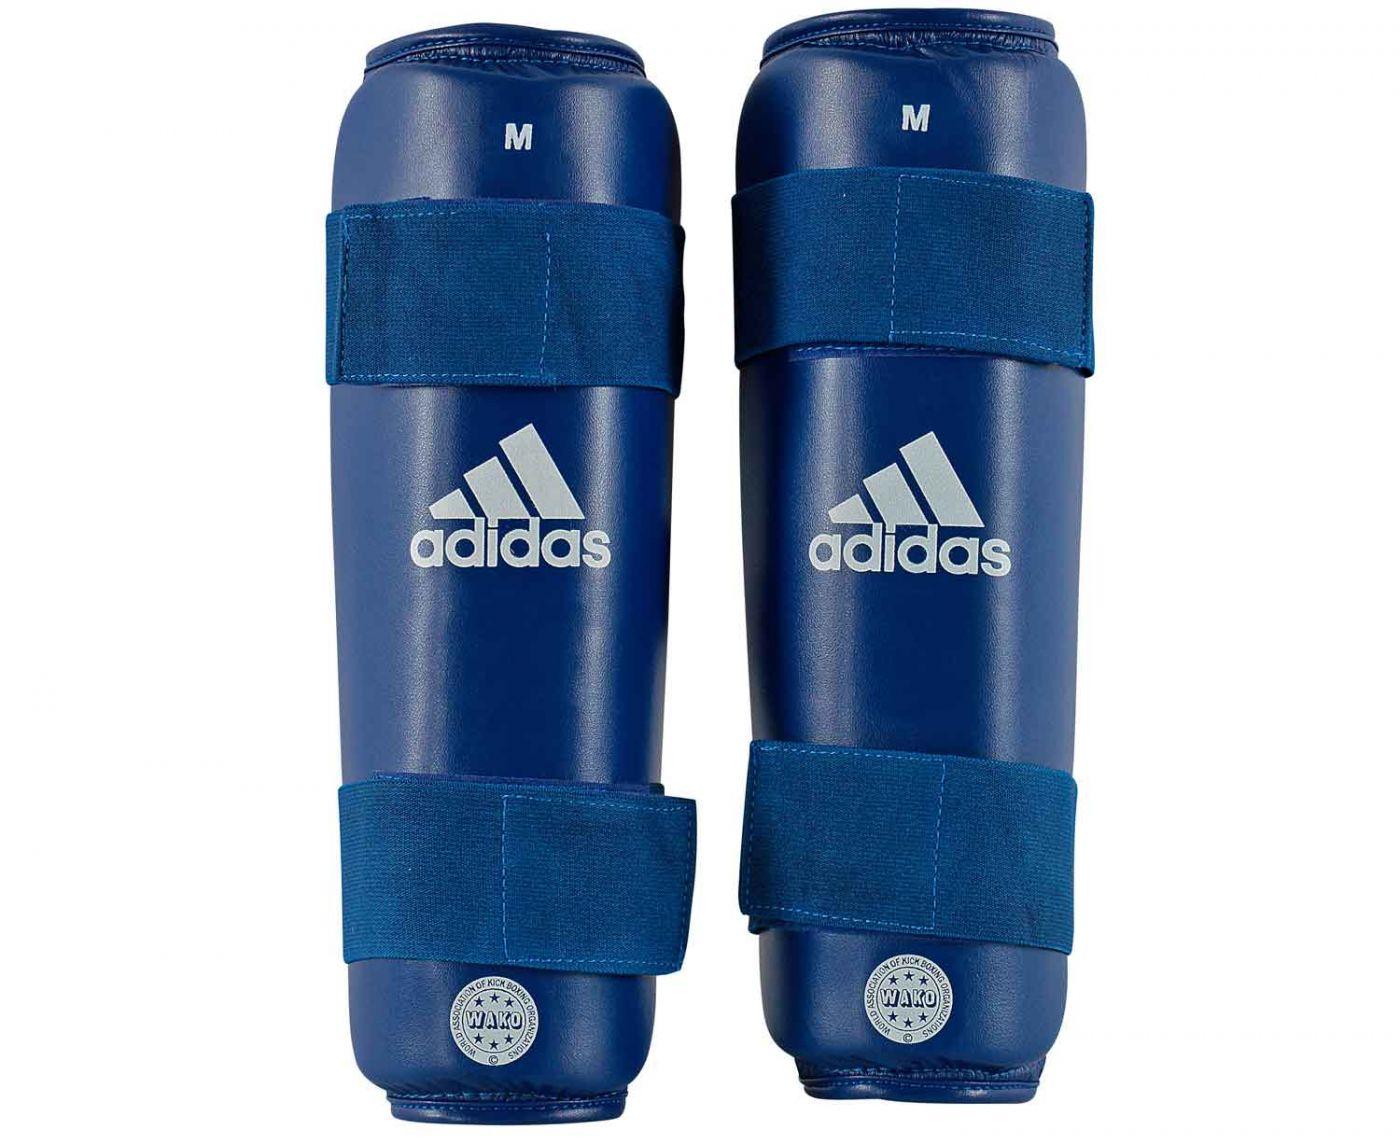 Защита голени Adidas WAKO Kickboxing Shin Guards синяя, размер L, артикул adiWAKOSG01